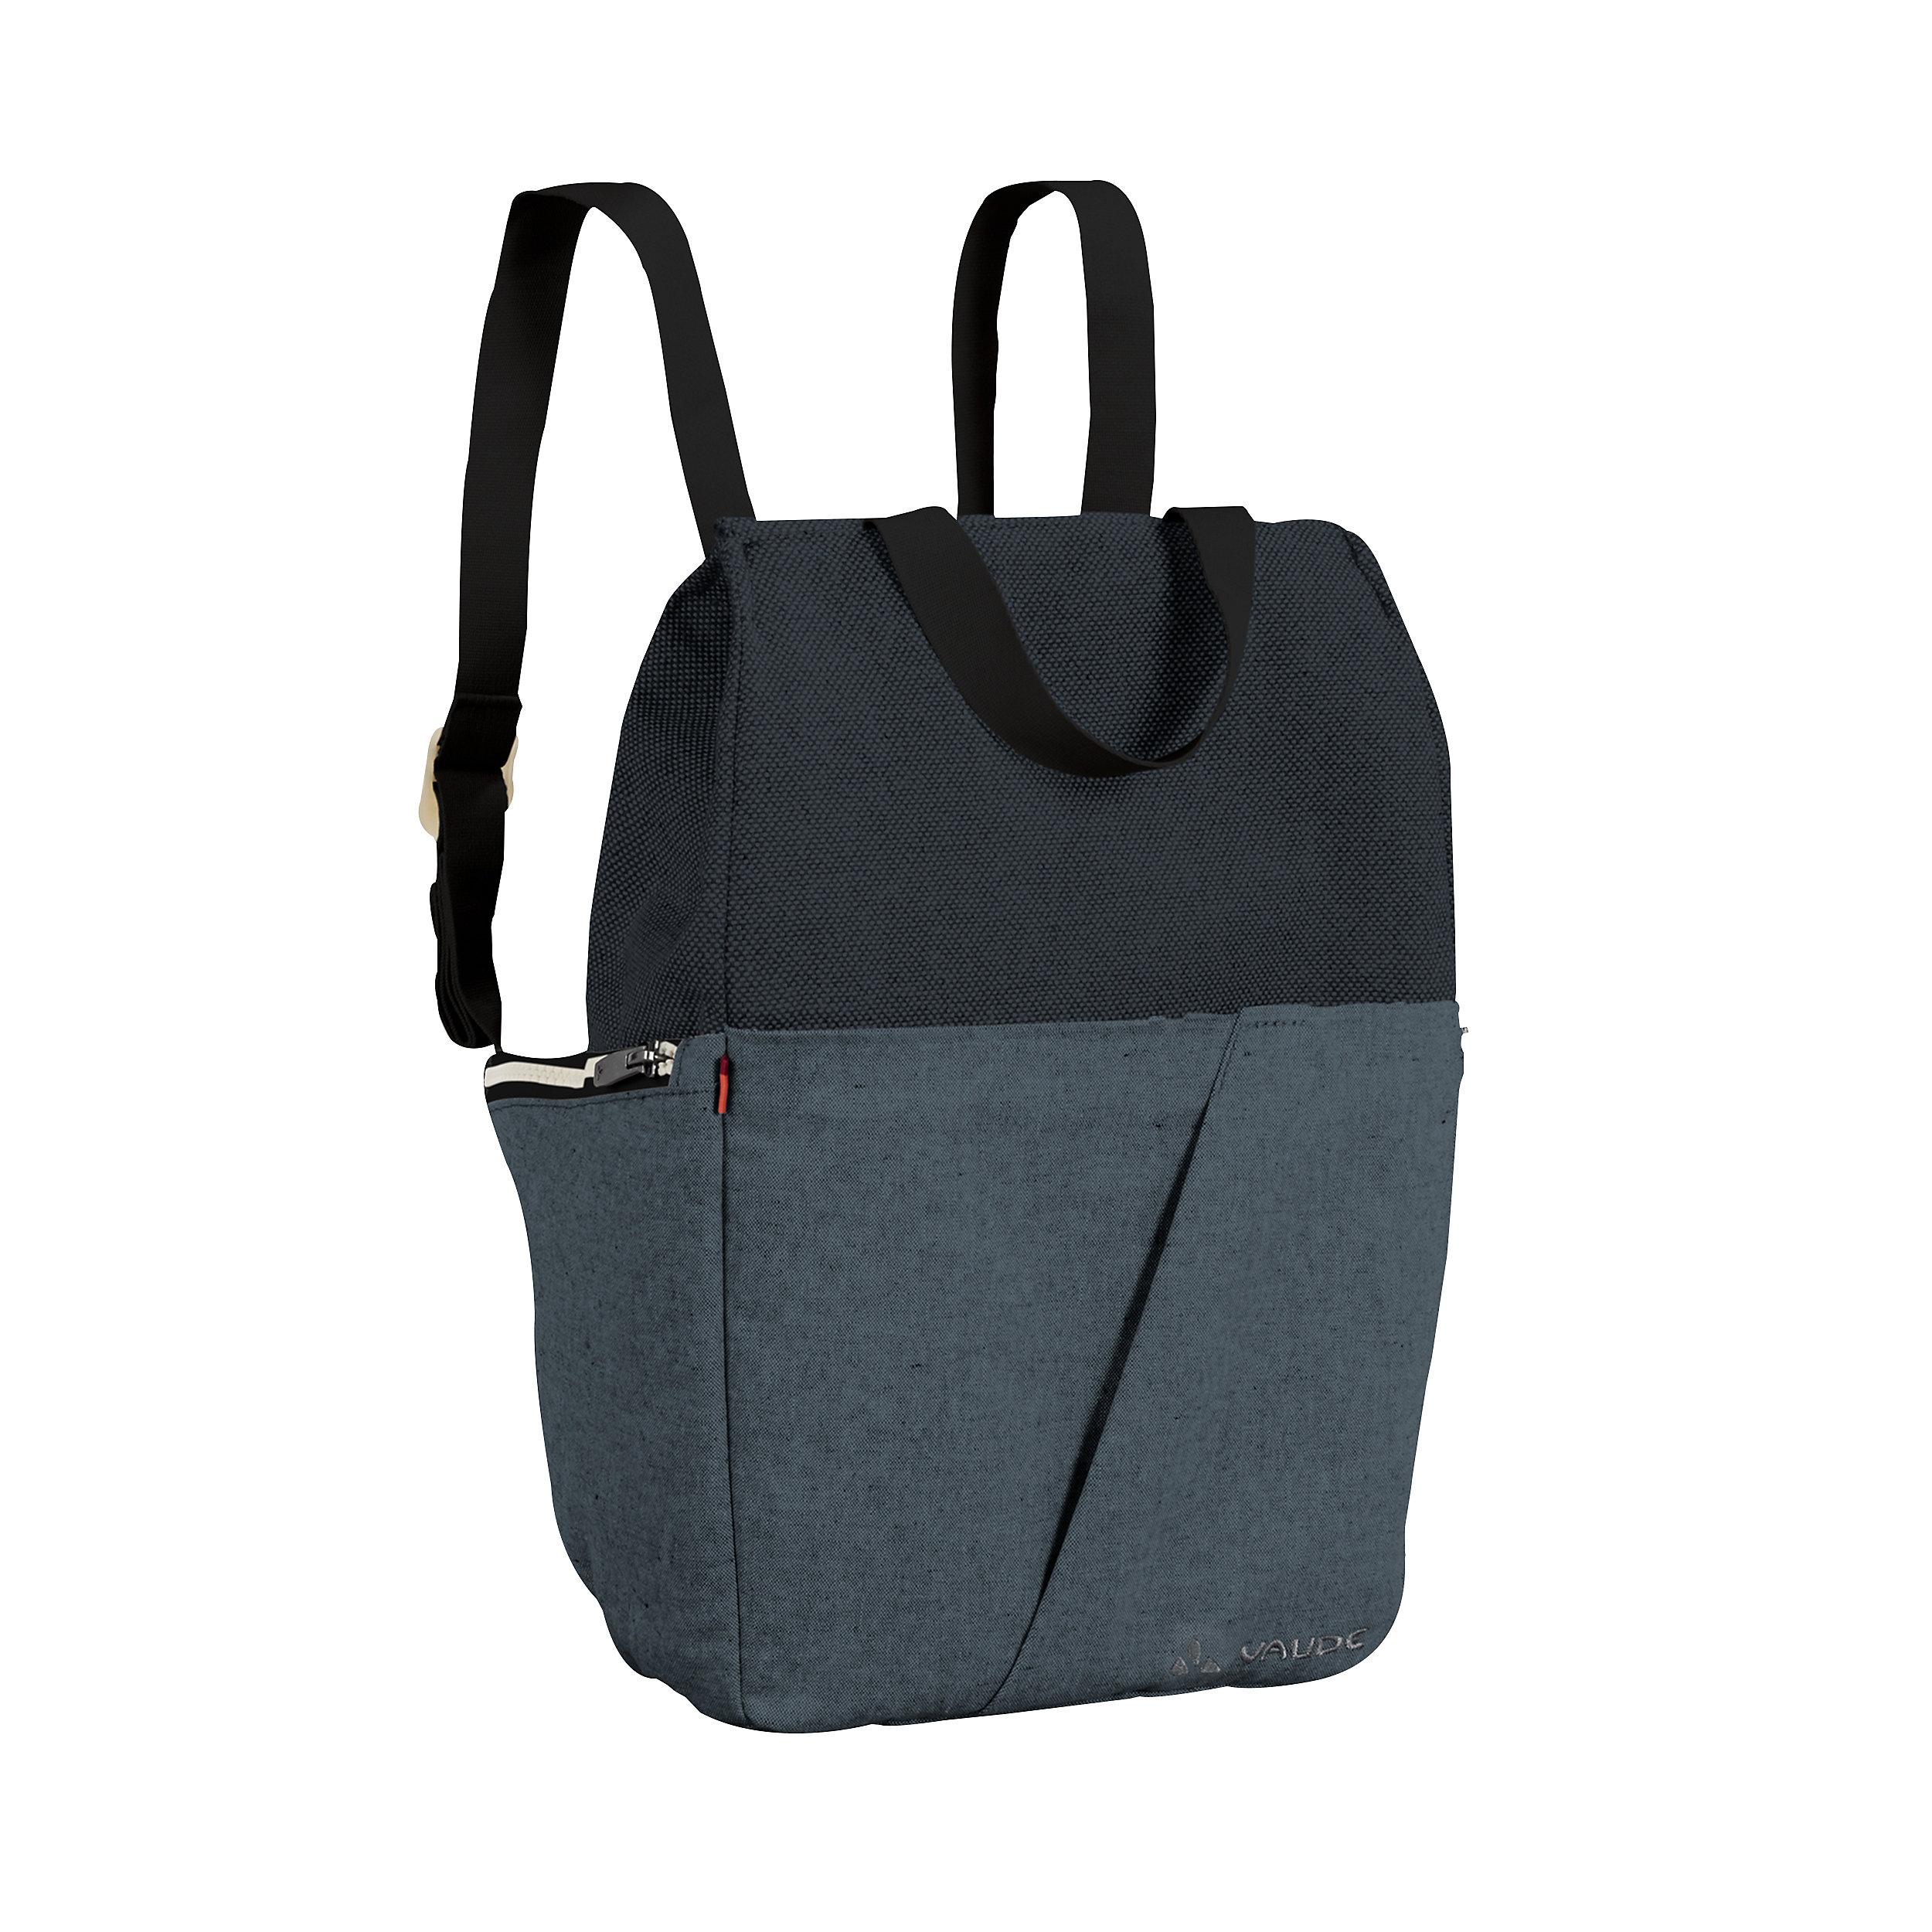 Backpack Balsa Lignum XS 9.5 Liter